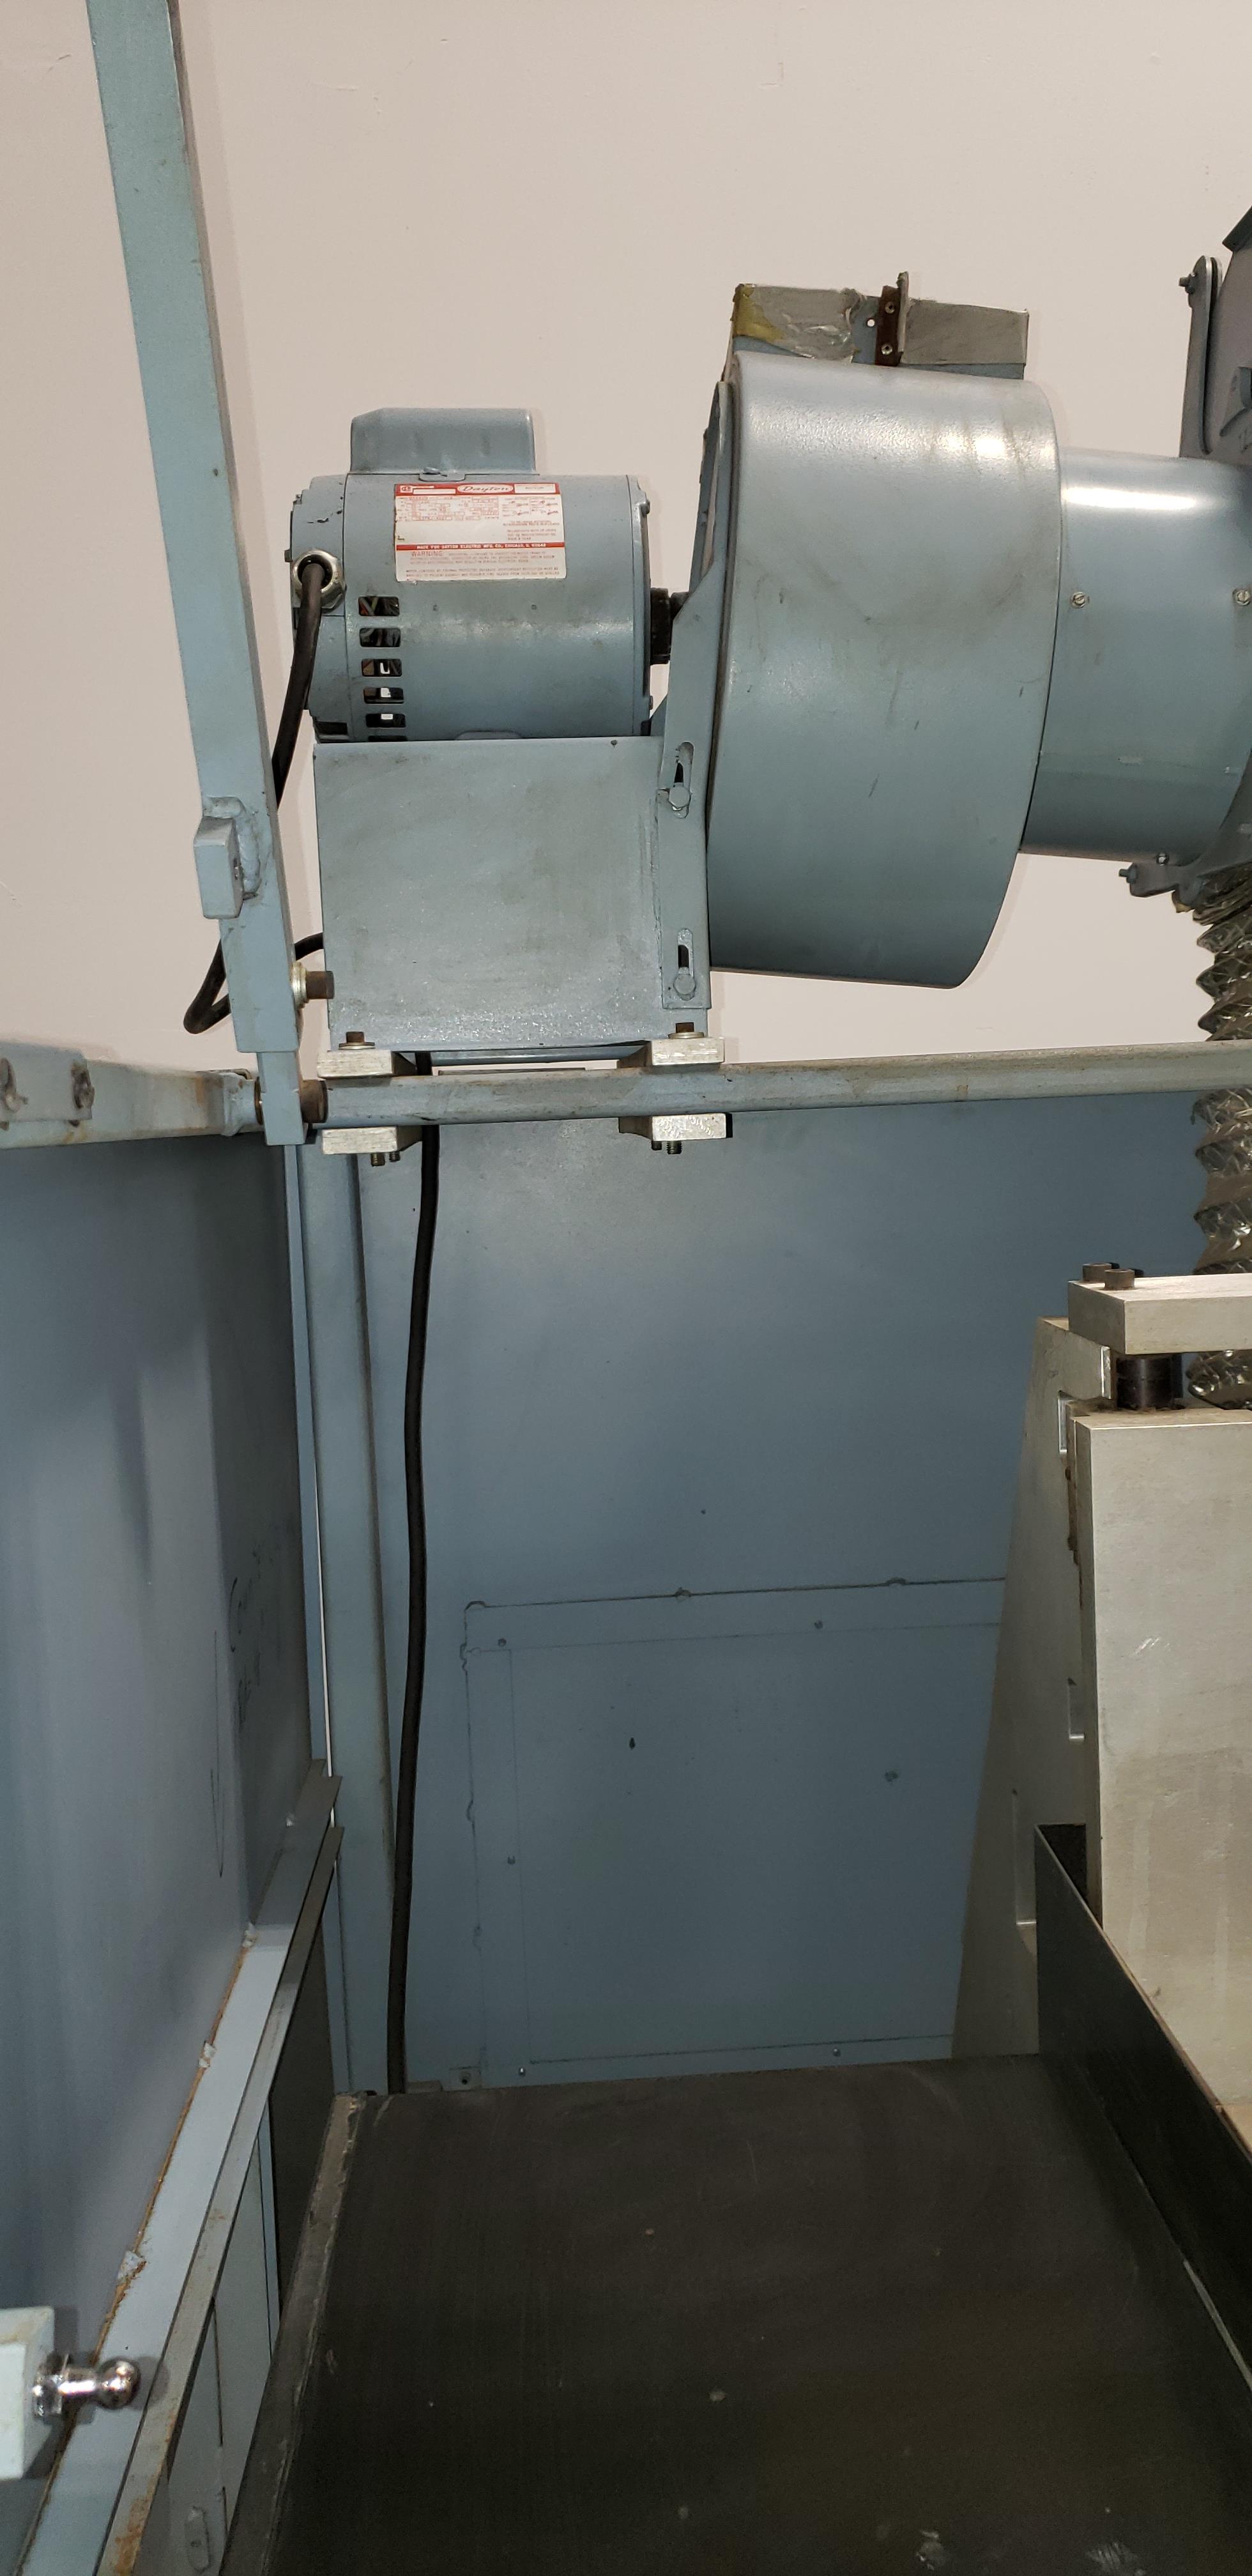 AutoRoll Model A9 /1- Color, Automatic, UV, Bottle Printer - Image 9 of 25